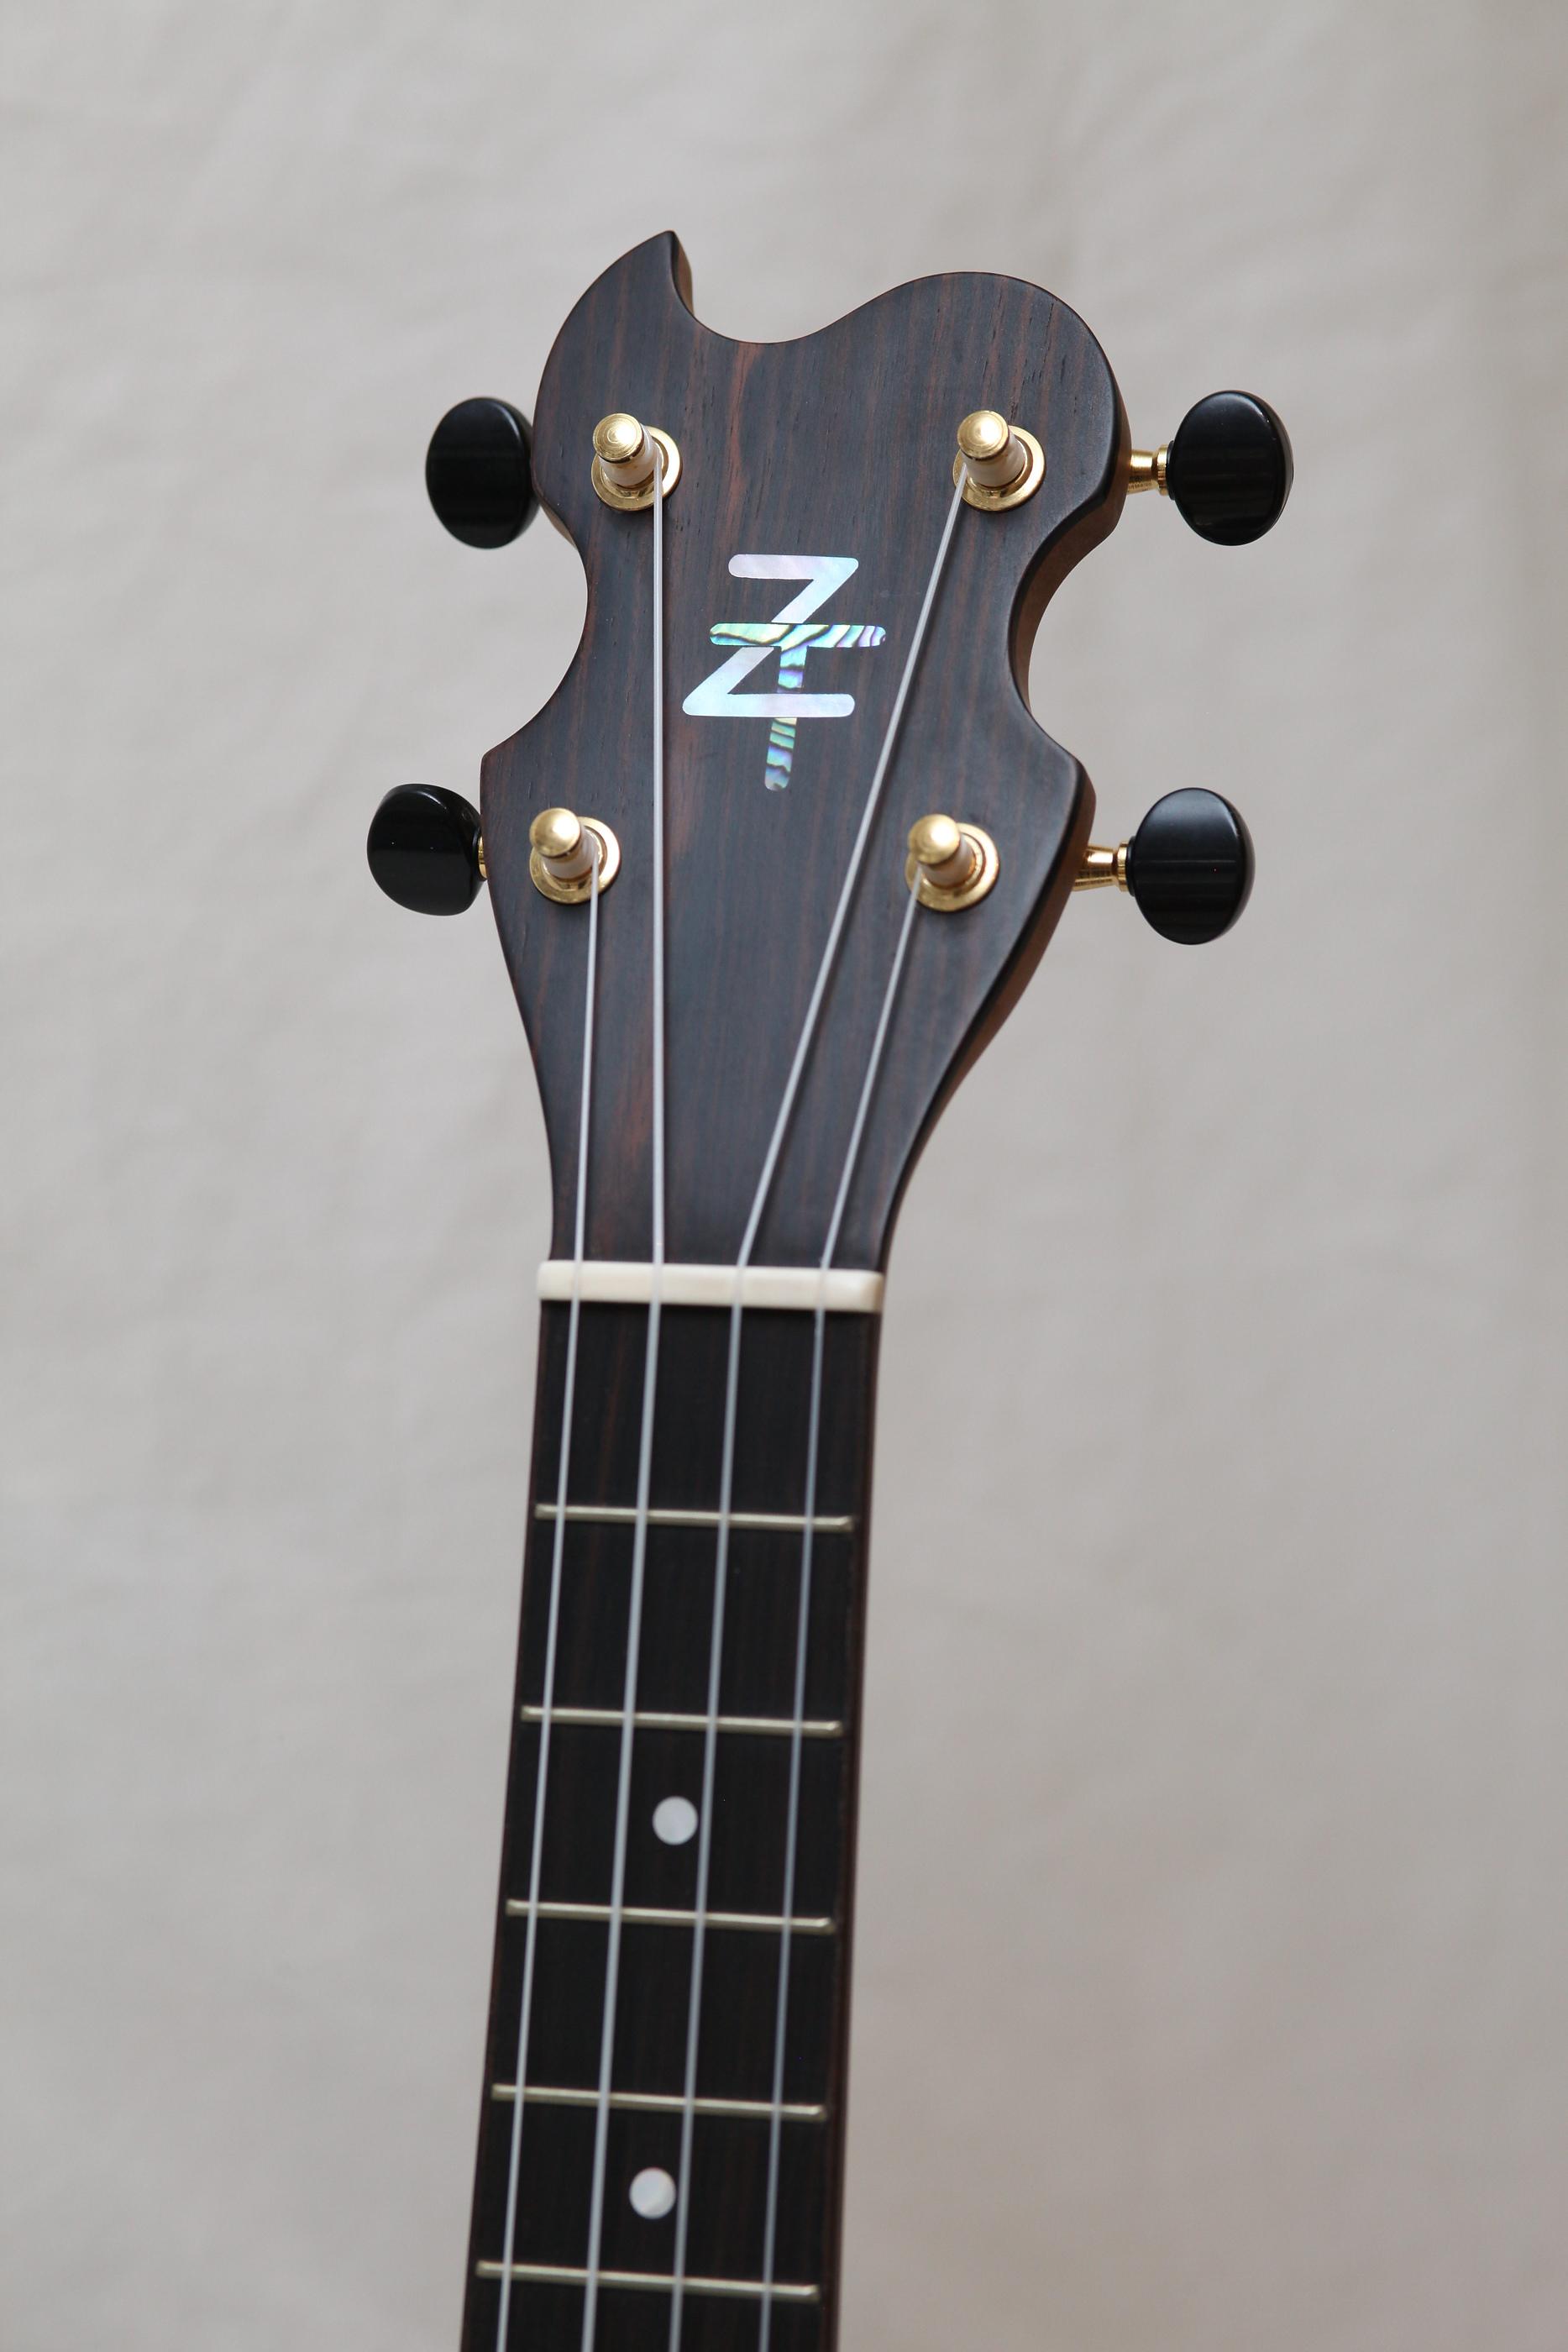 ZT Concert Ukulele in Acacia